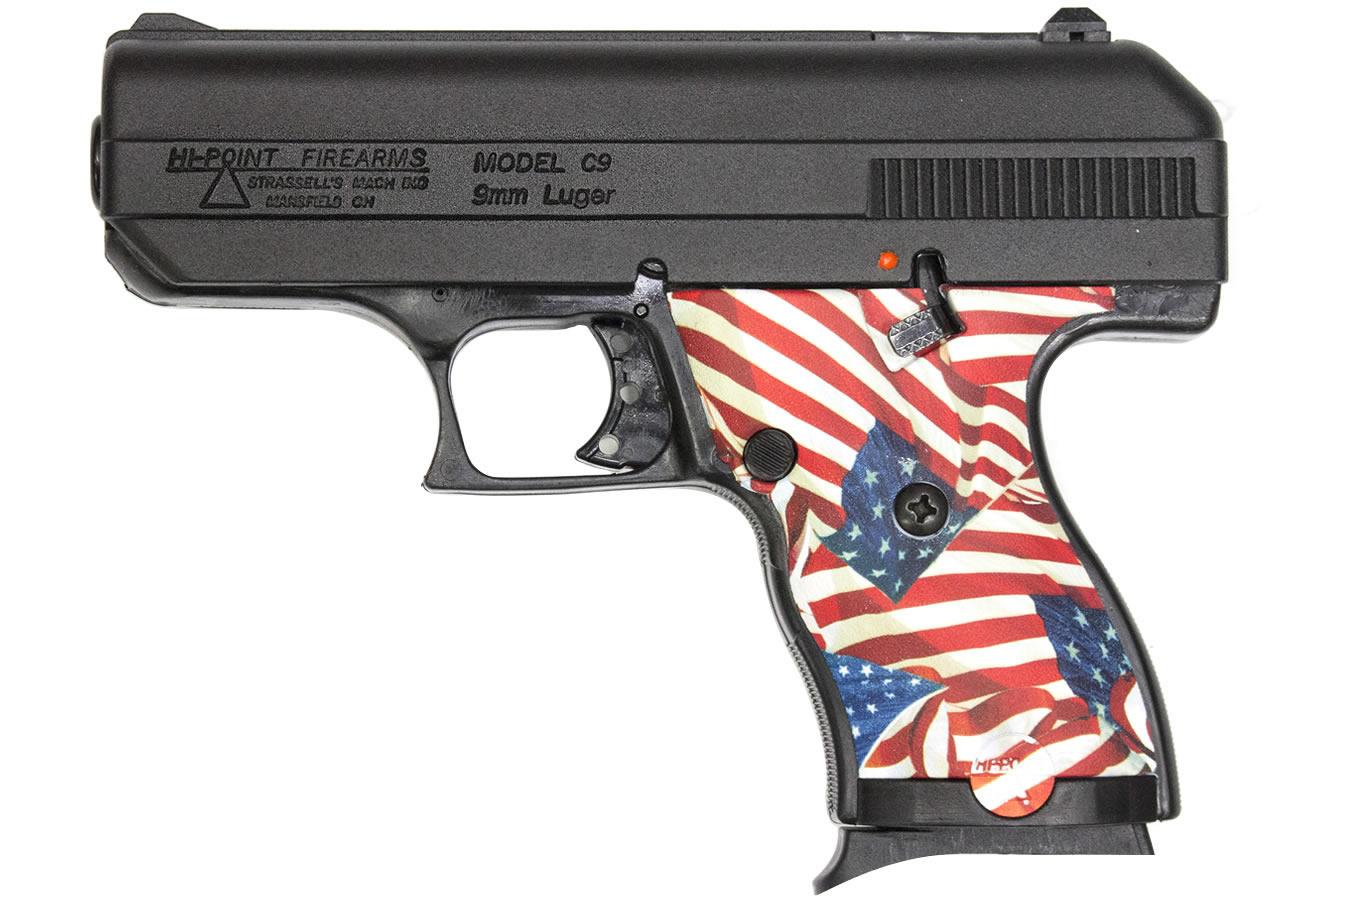 C9 9mm Patriot Pistol with American Flag Grip